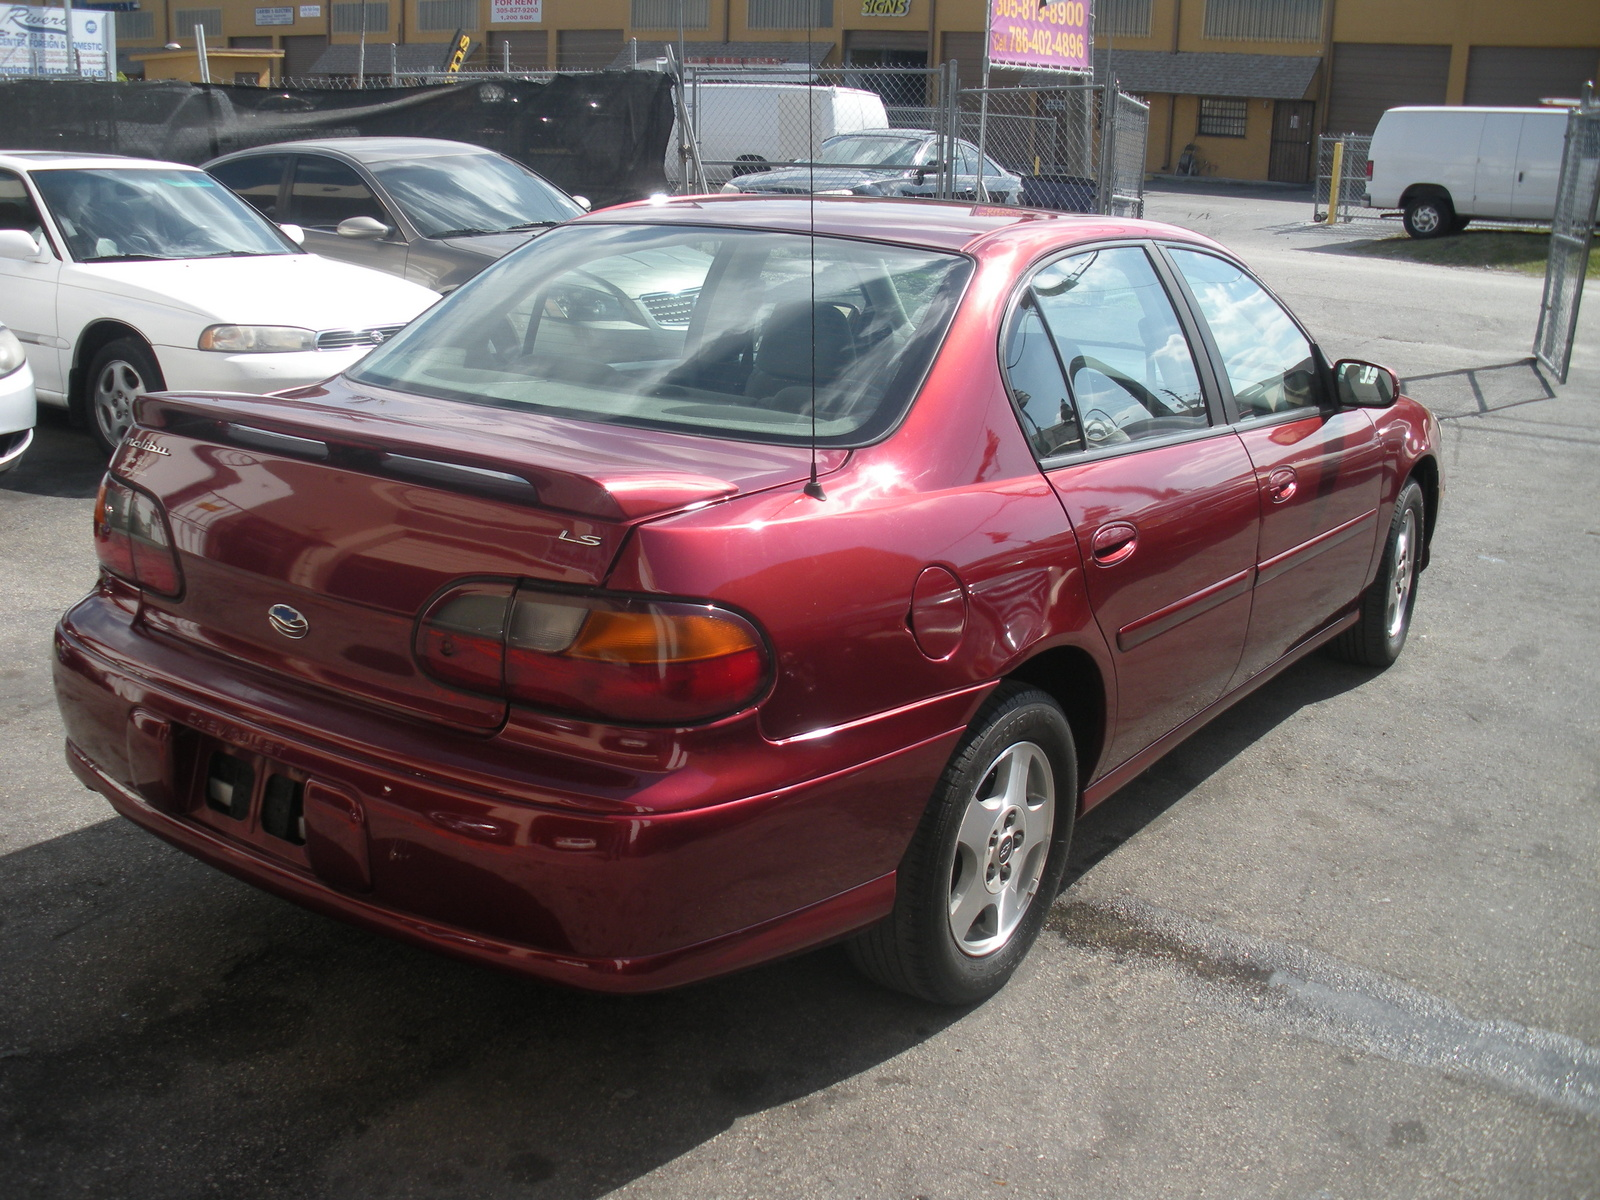 2003 Chevrolet Malibu - Exterior Pictures